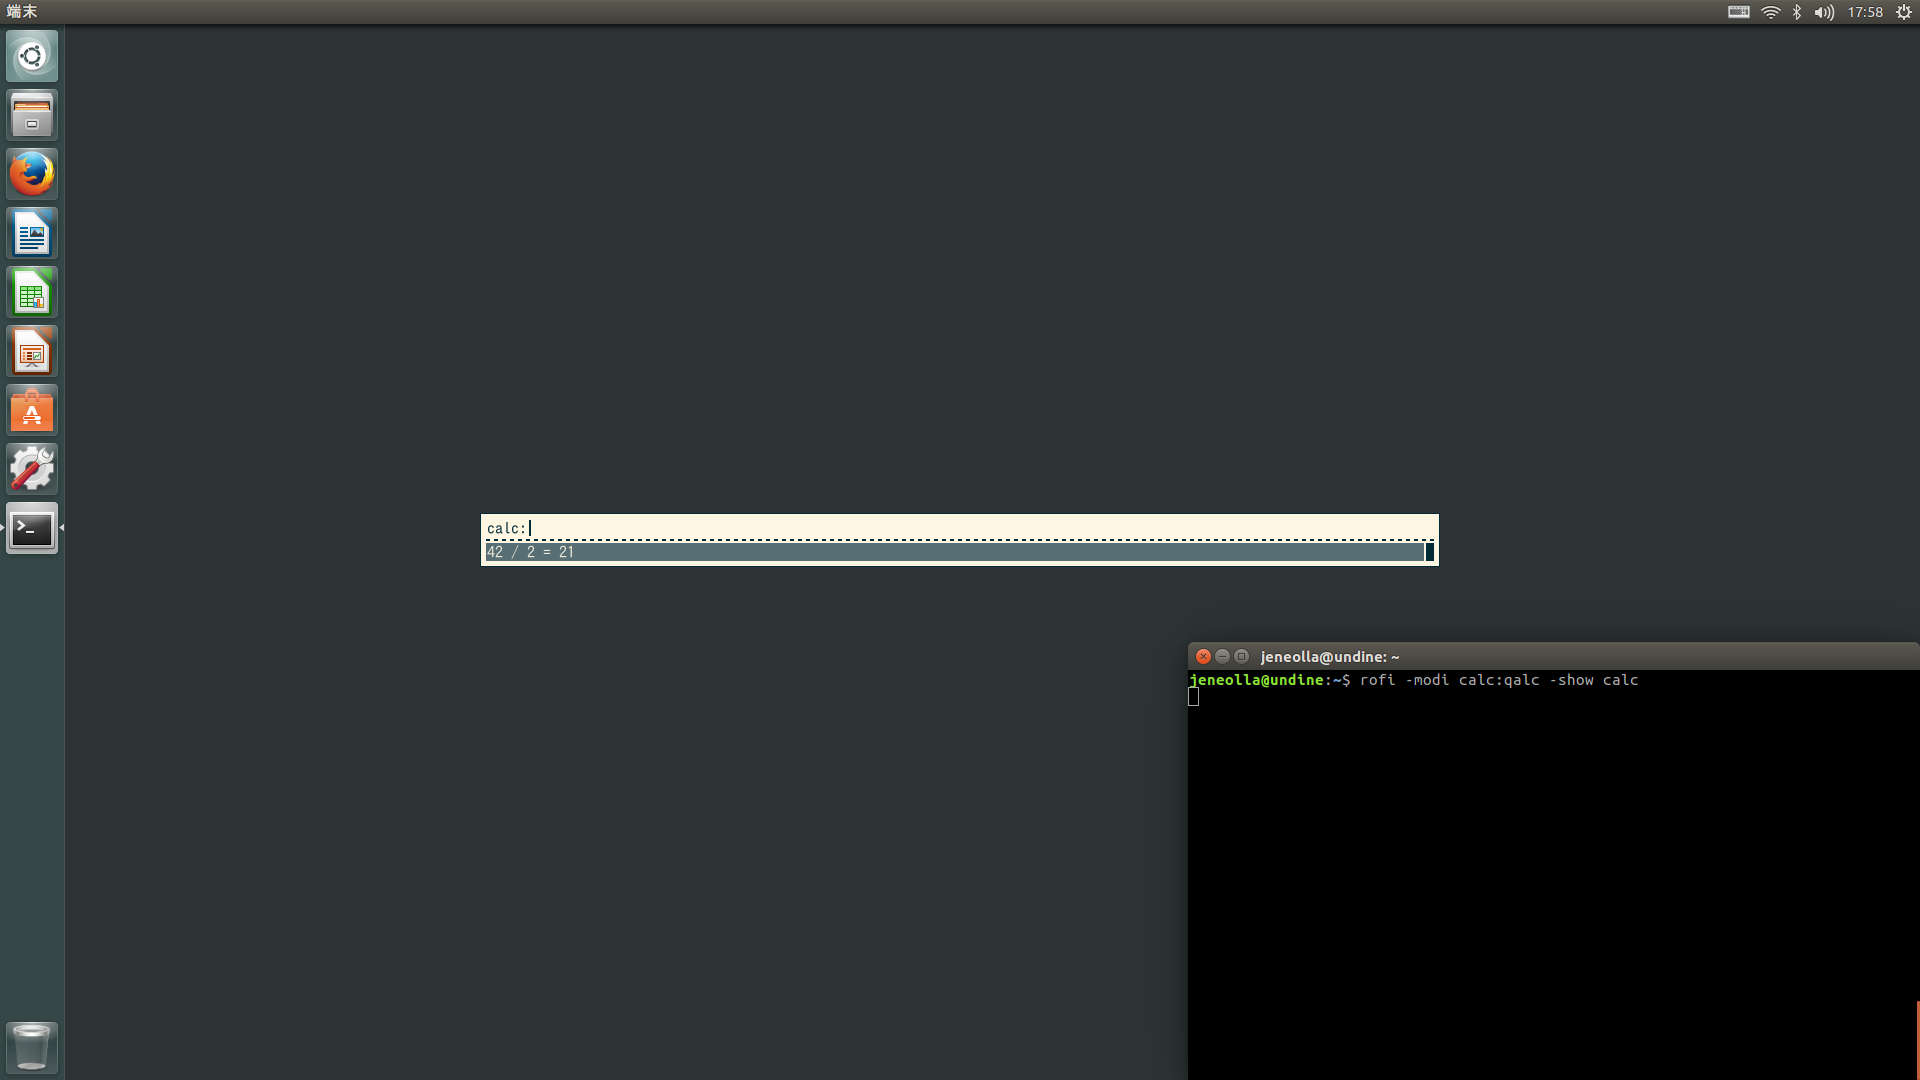 rofi_normal_script_qalc.jpg